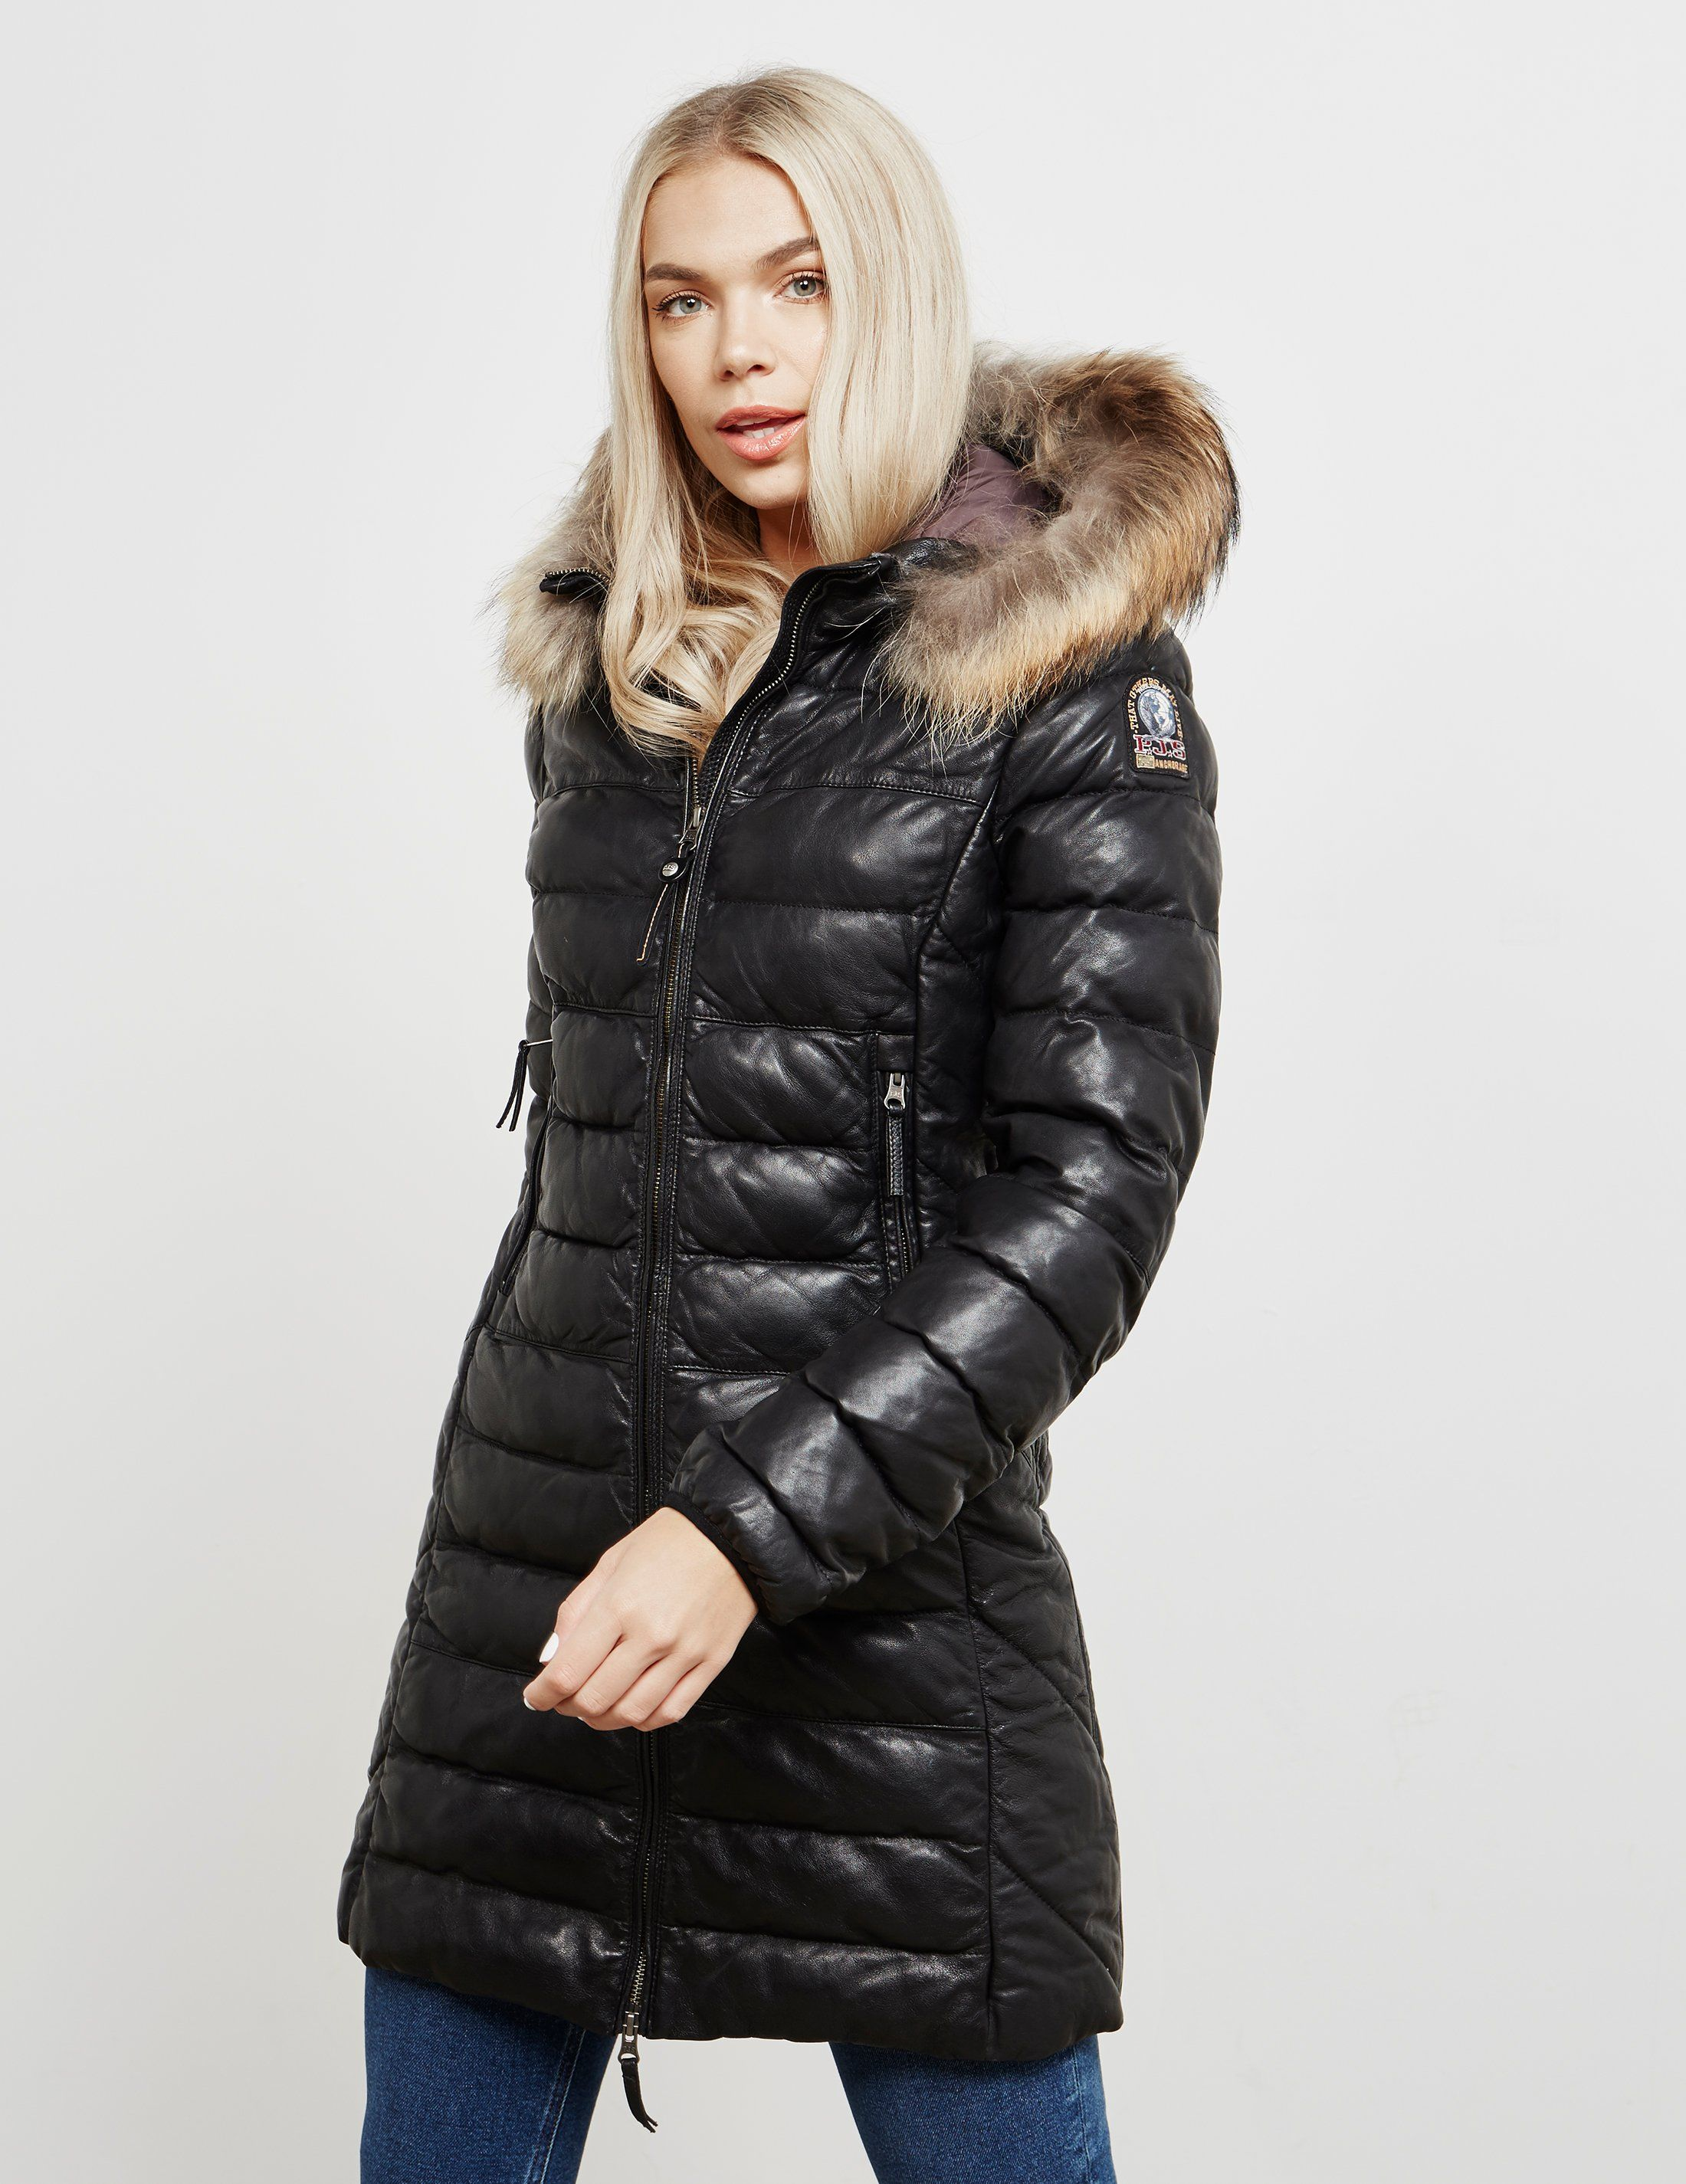 Parajumpers Demi Leather Parka Jacket - Online Exclusive